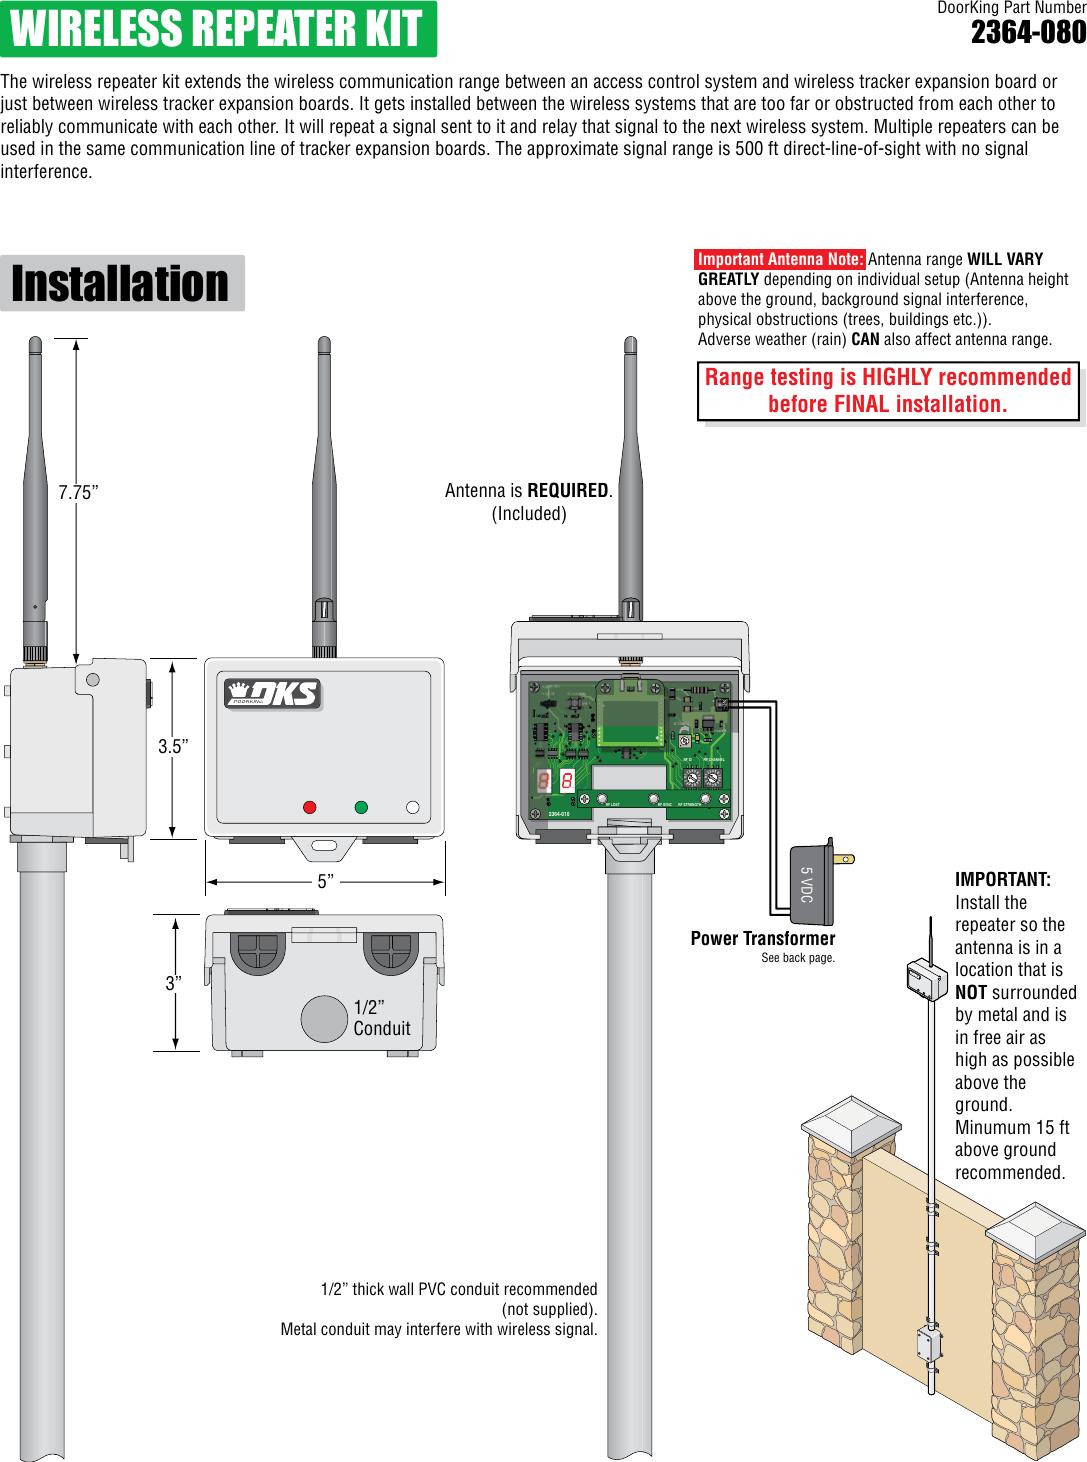 hight resolution of doorking 2364 065 e 11 14 door king wireless repeater kit installation manual